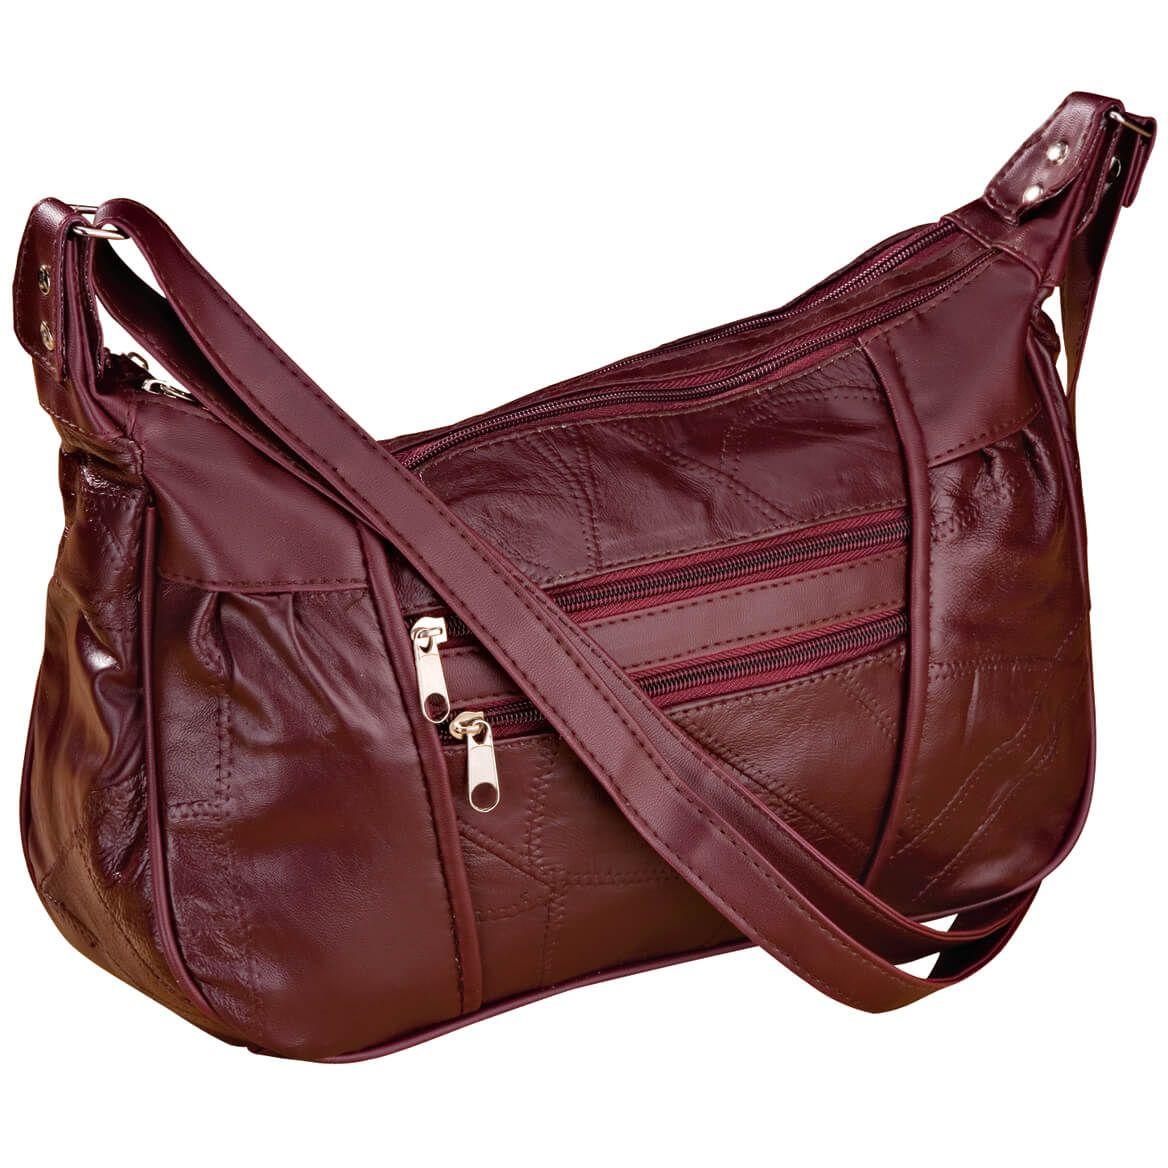 Burgundy Leather Handbag-339981